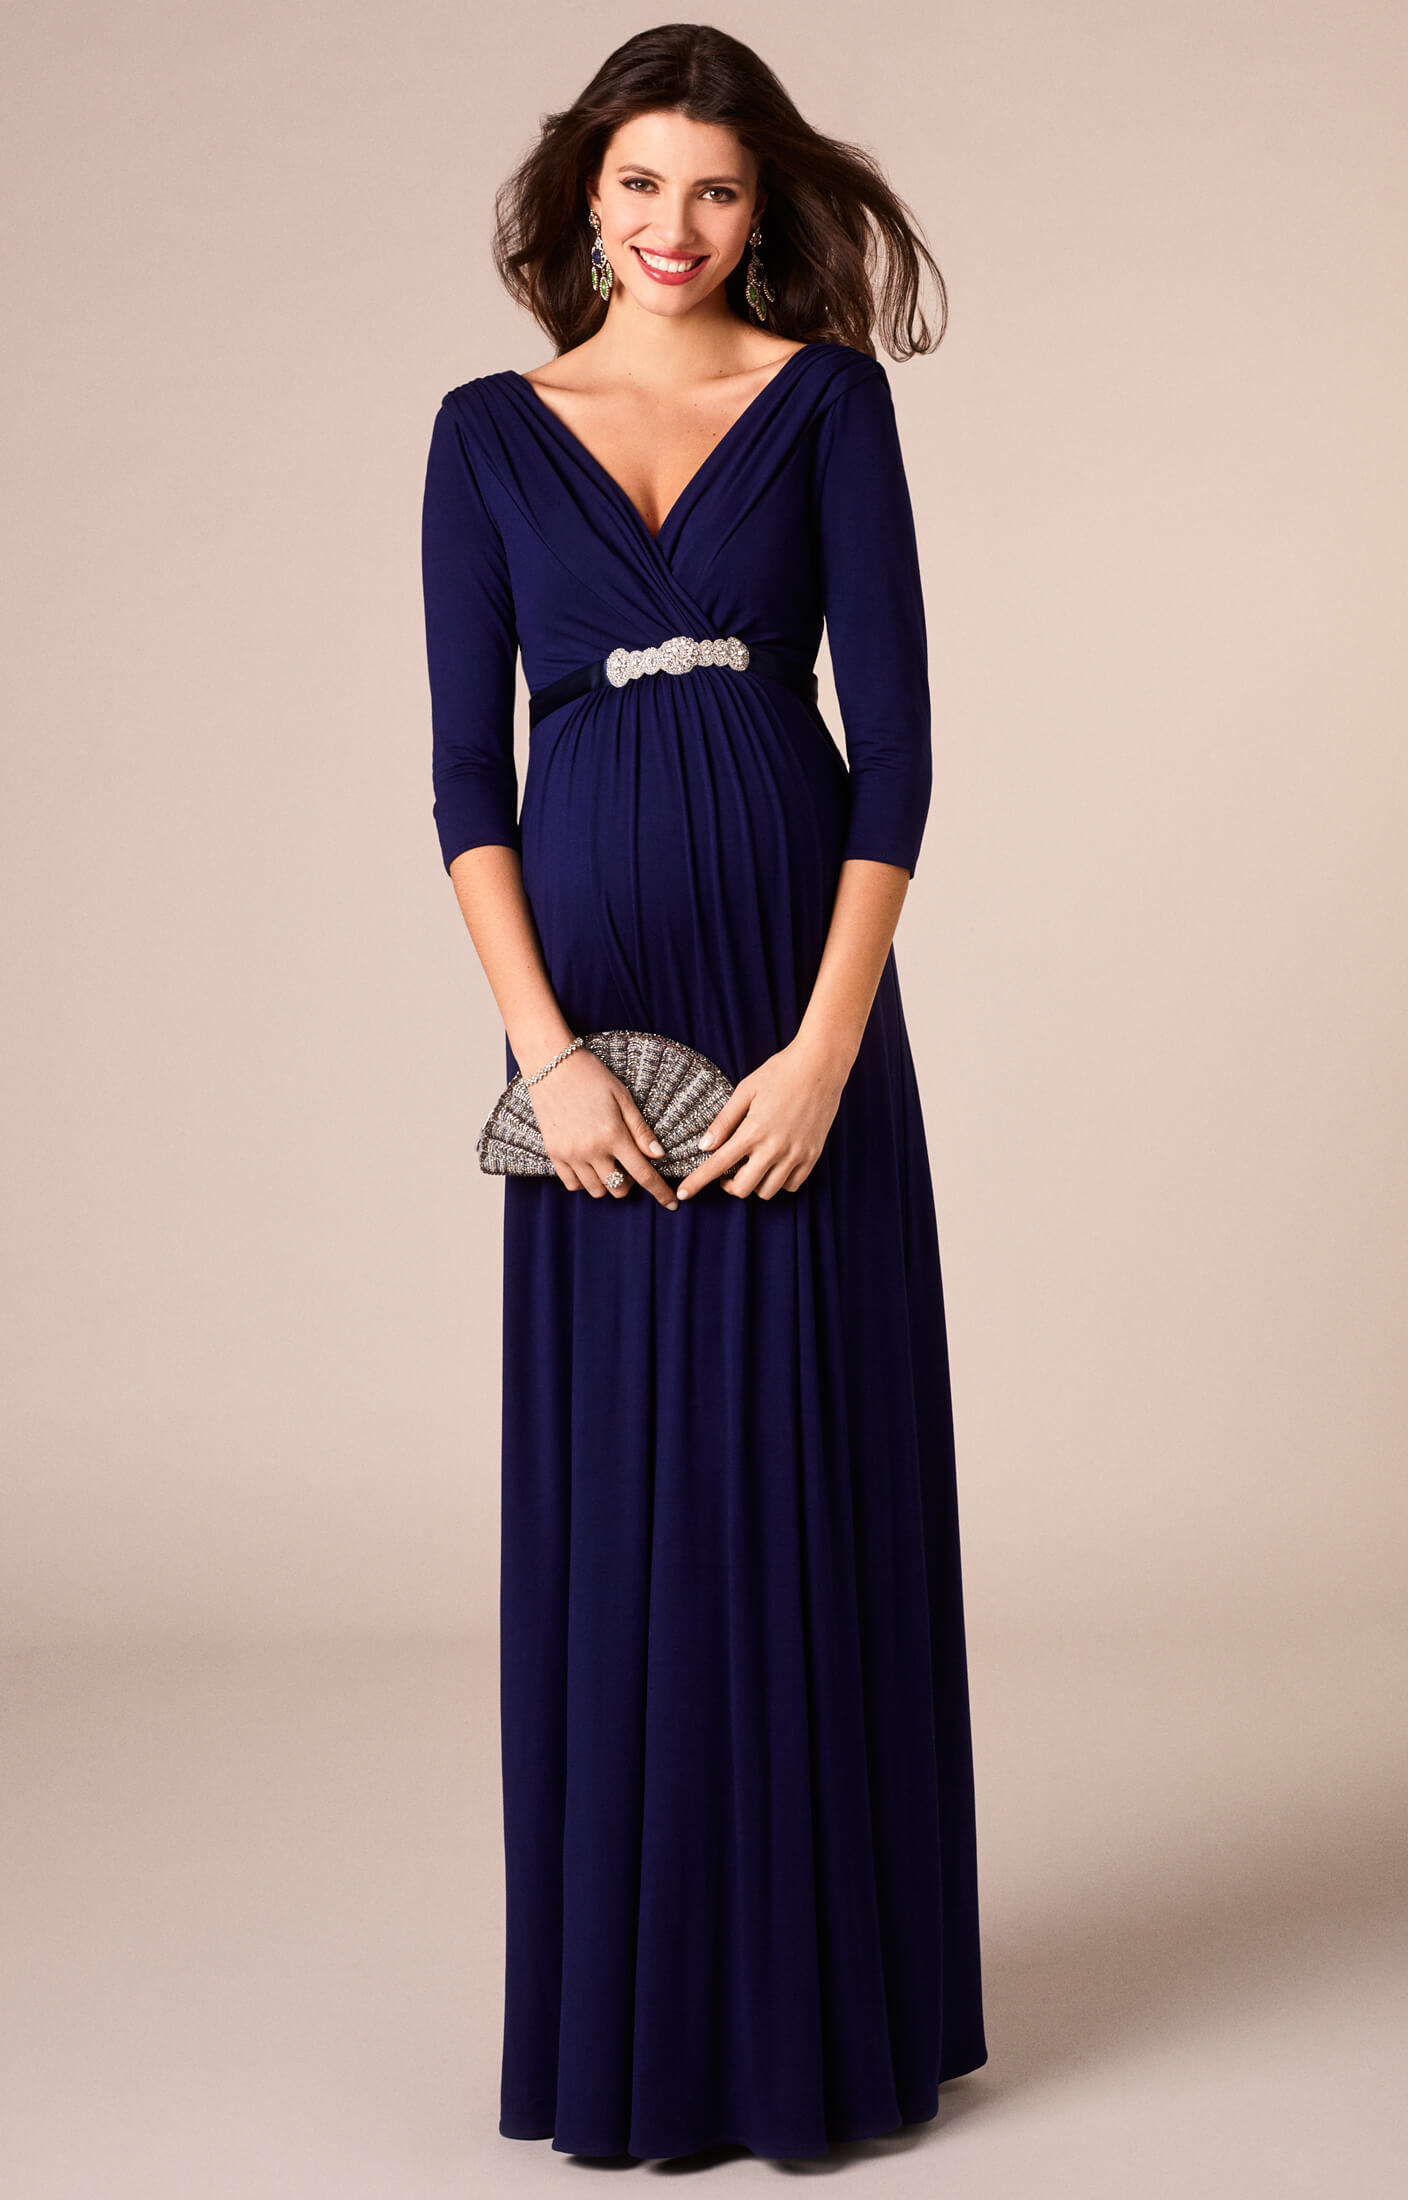 Umstandsmoden Kleid Willow in Eclipse Blue